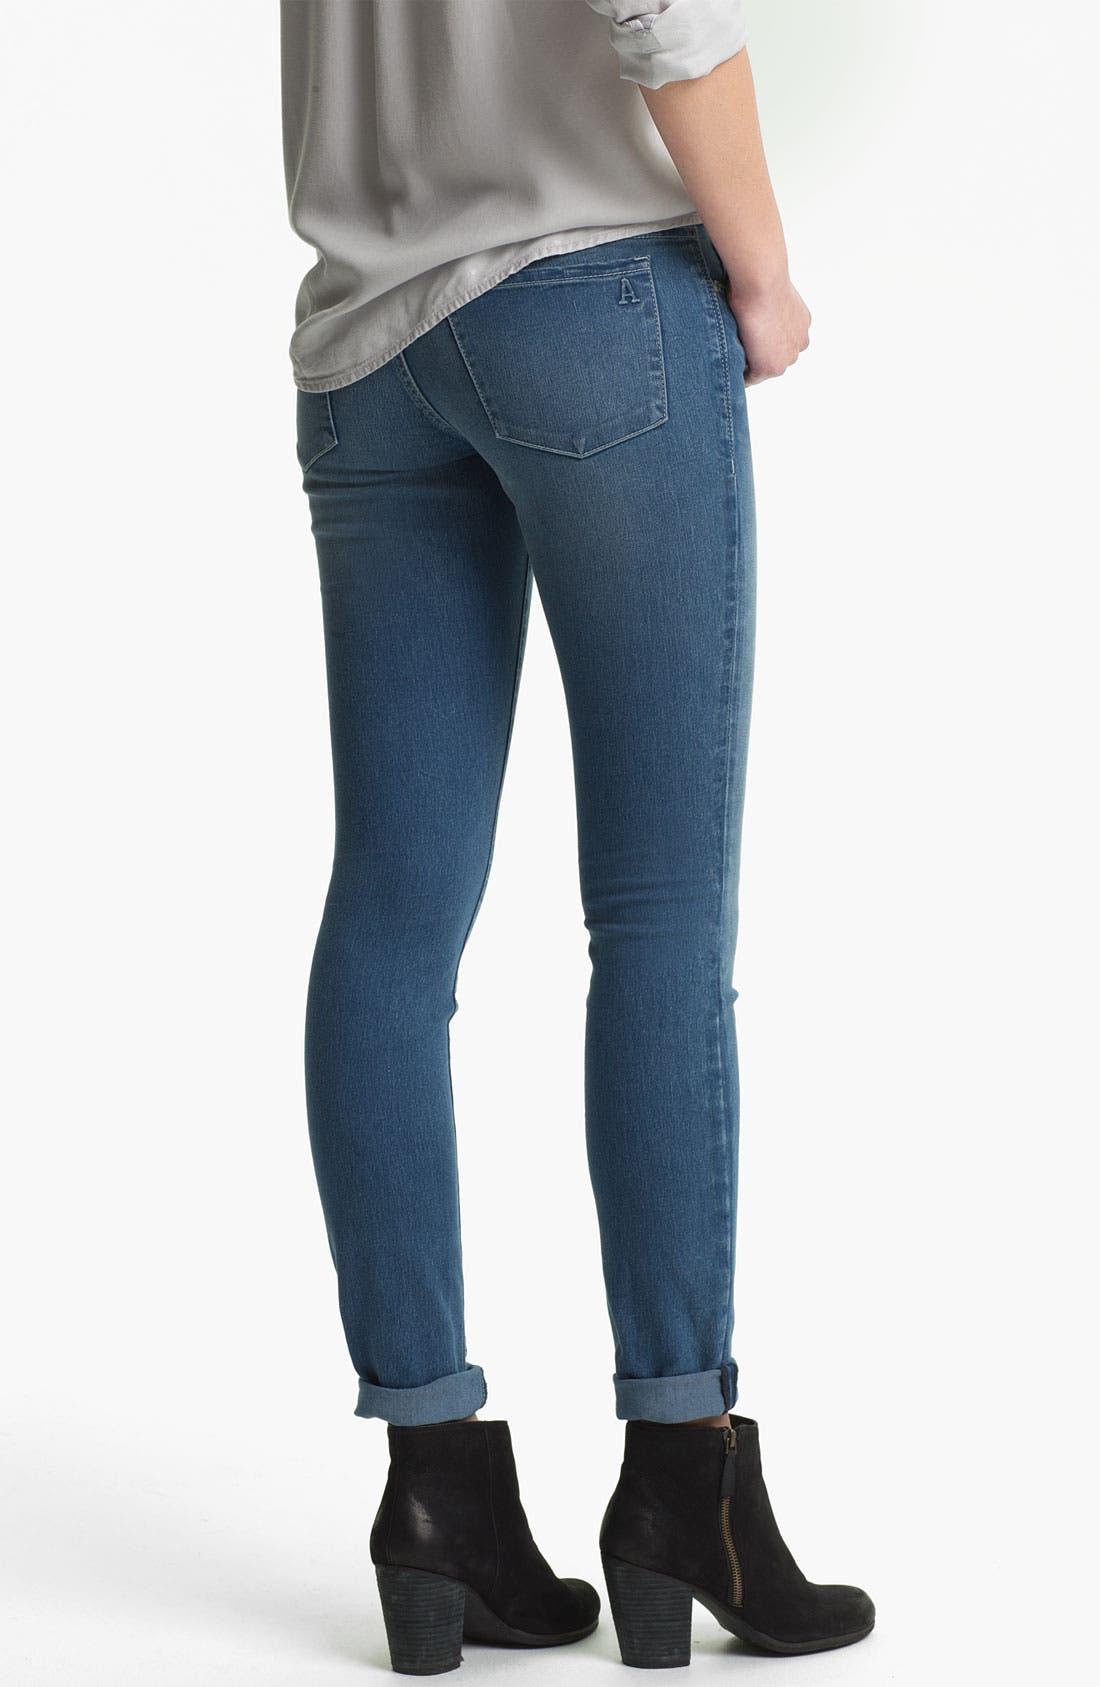 Alternate Image 2  - Articles of Society 'Mya' Skinny Jeans (Atlantic) (Juniors)